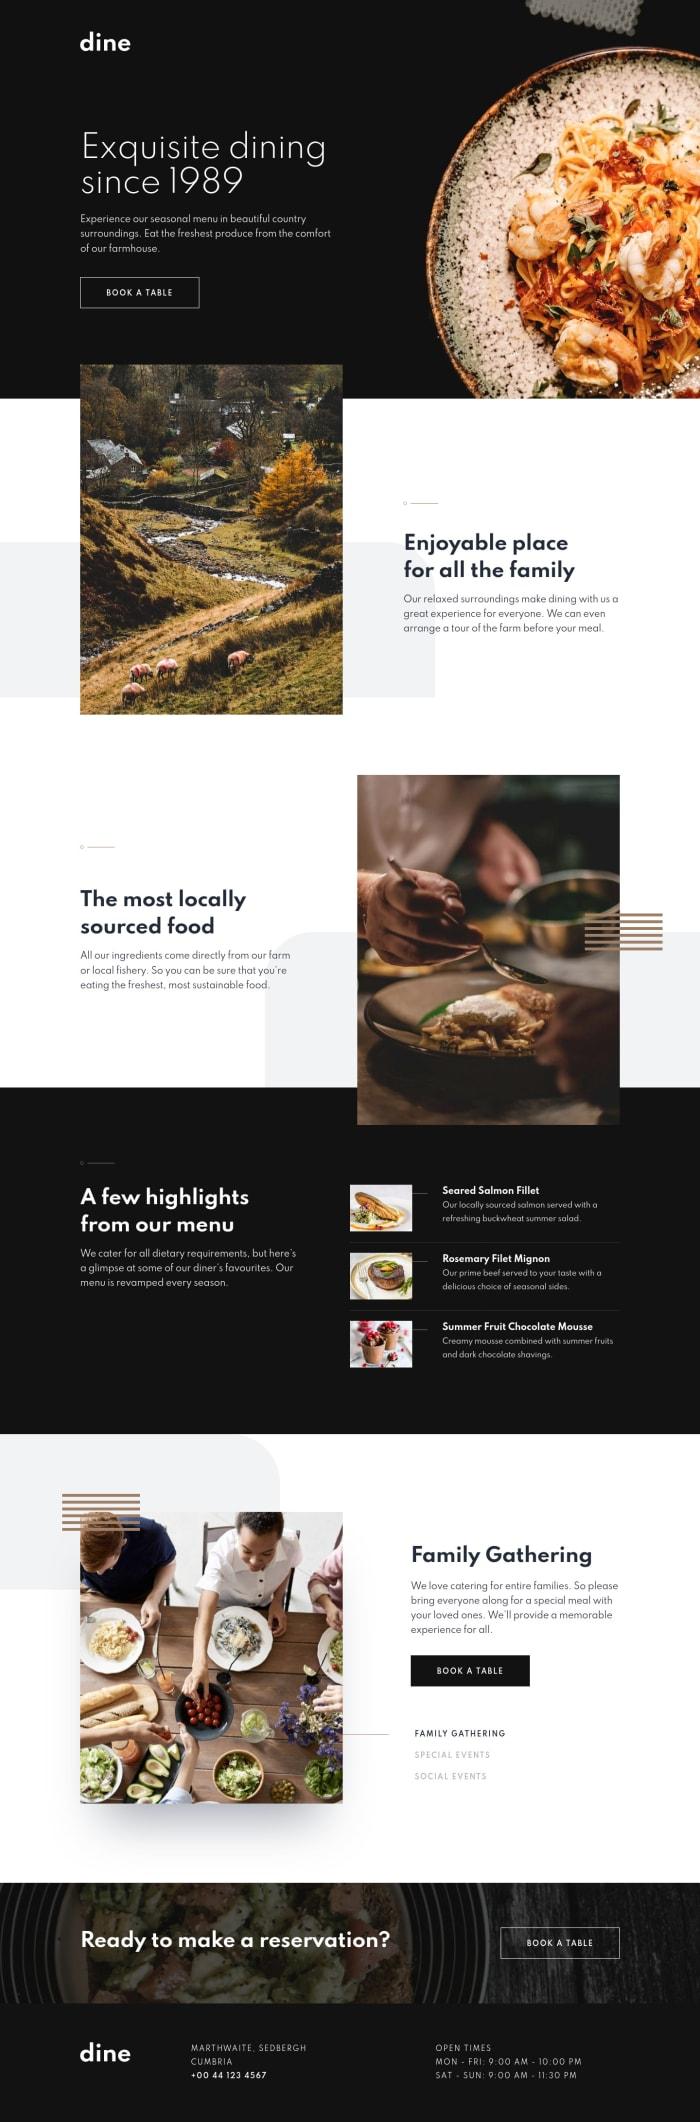 Desktop design screenshot for the Dine restaurant website coding challenge